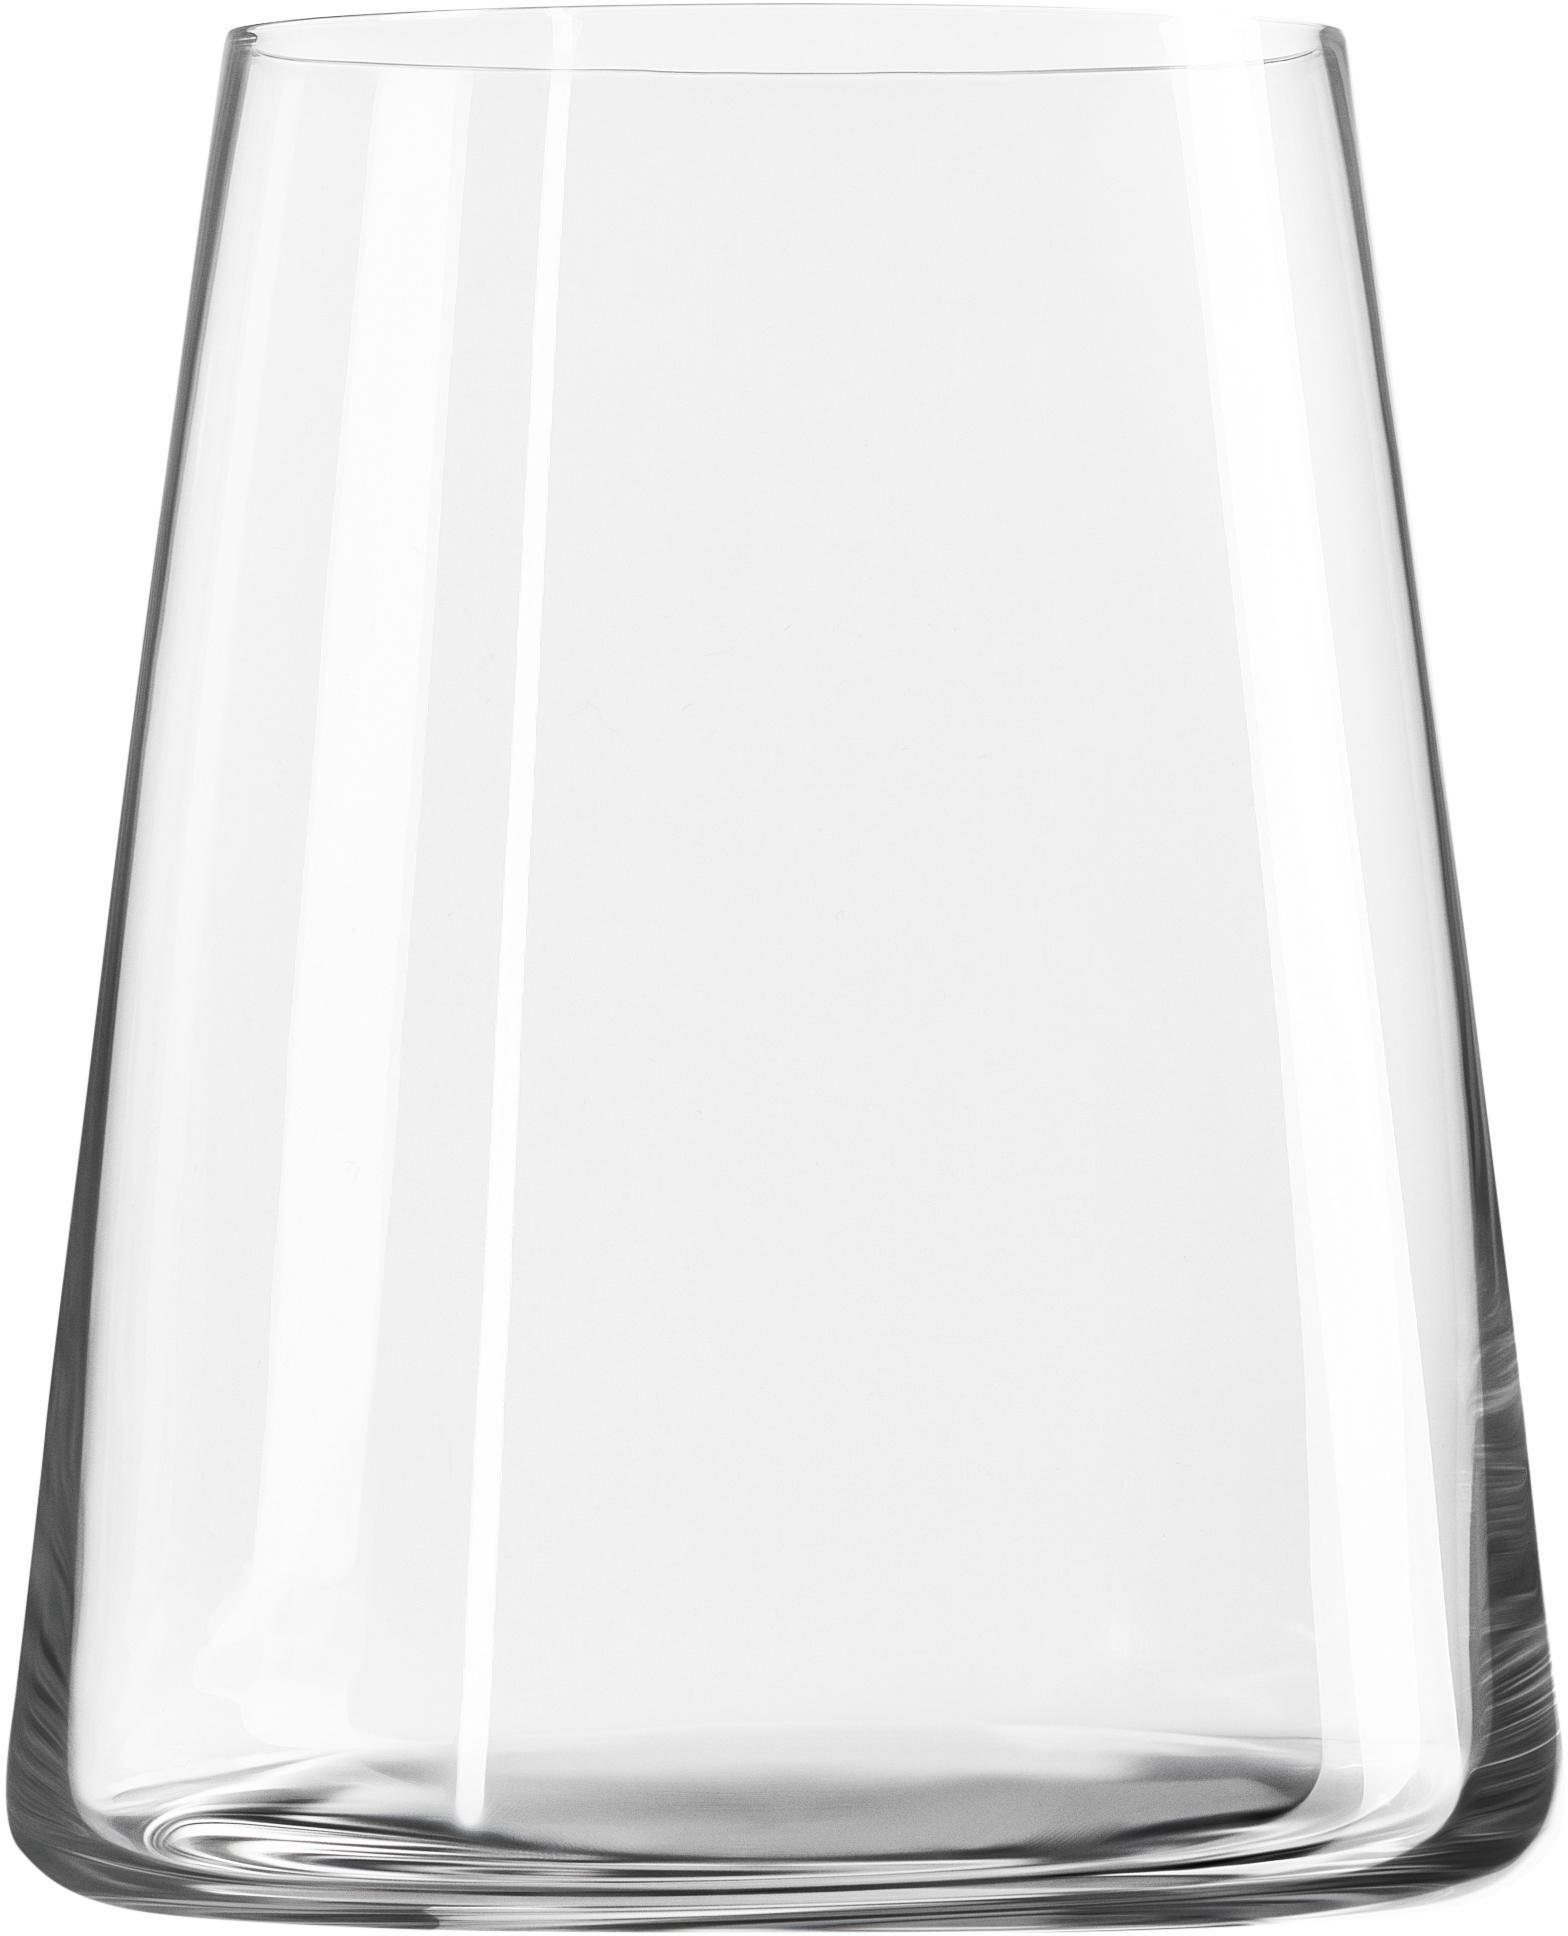 Kristallen glazen Power, 6 stuks, Kristalglas, Transparant, Ø 9 x H 10 cm